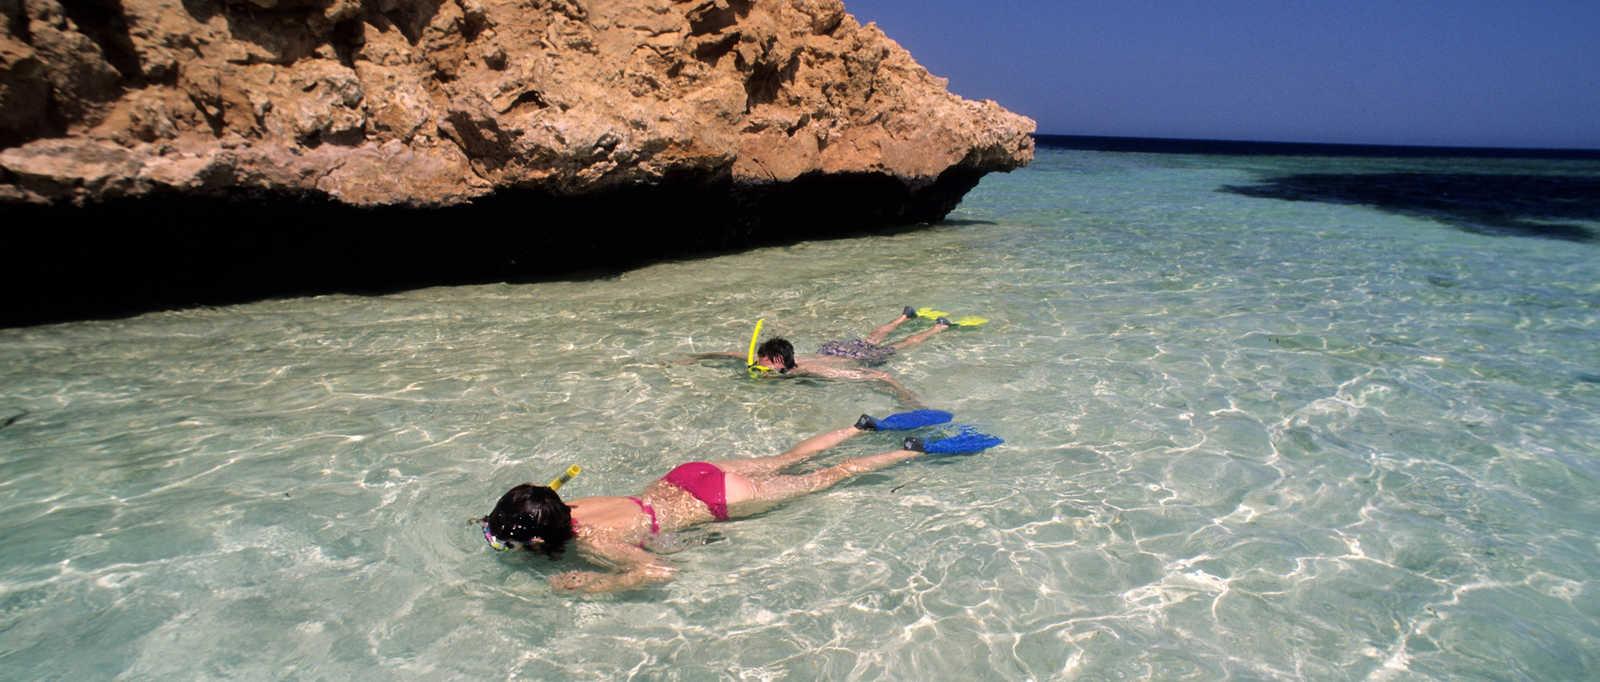 snorkeling, Red Sea, Egypt